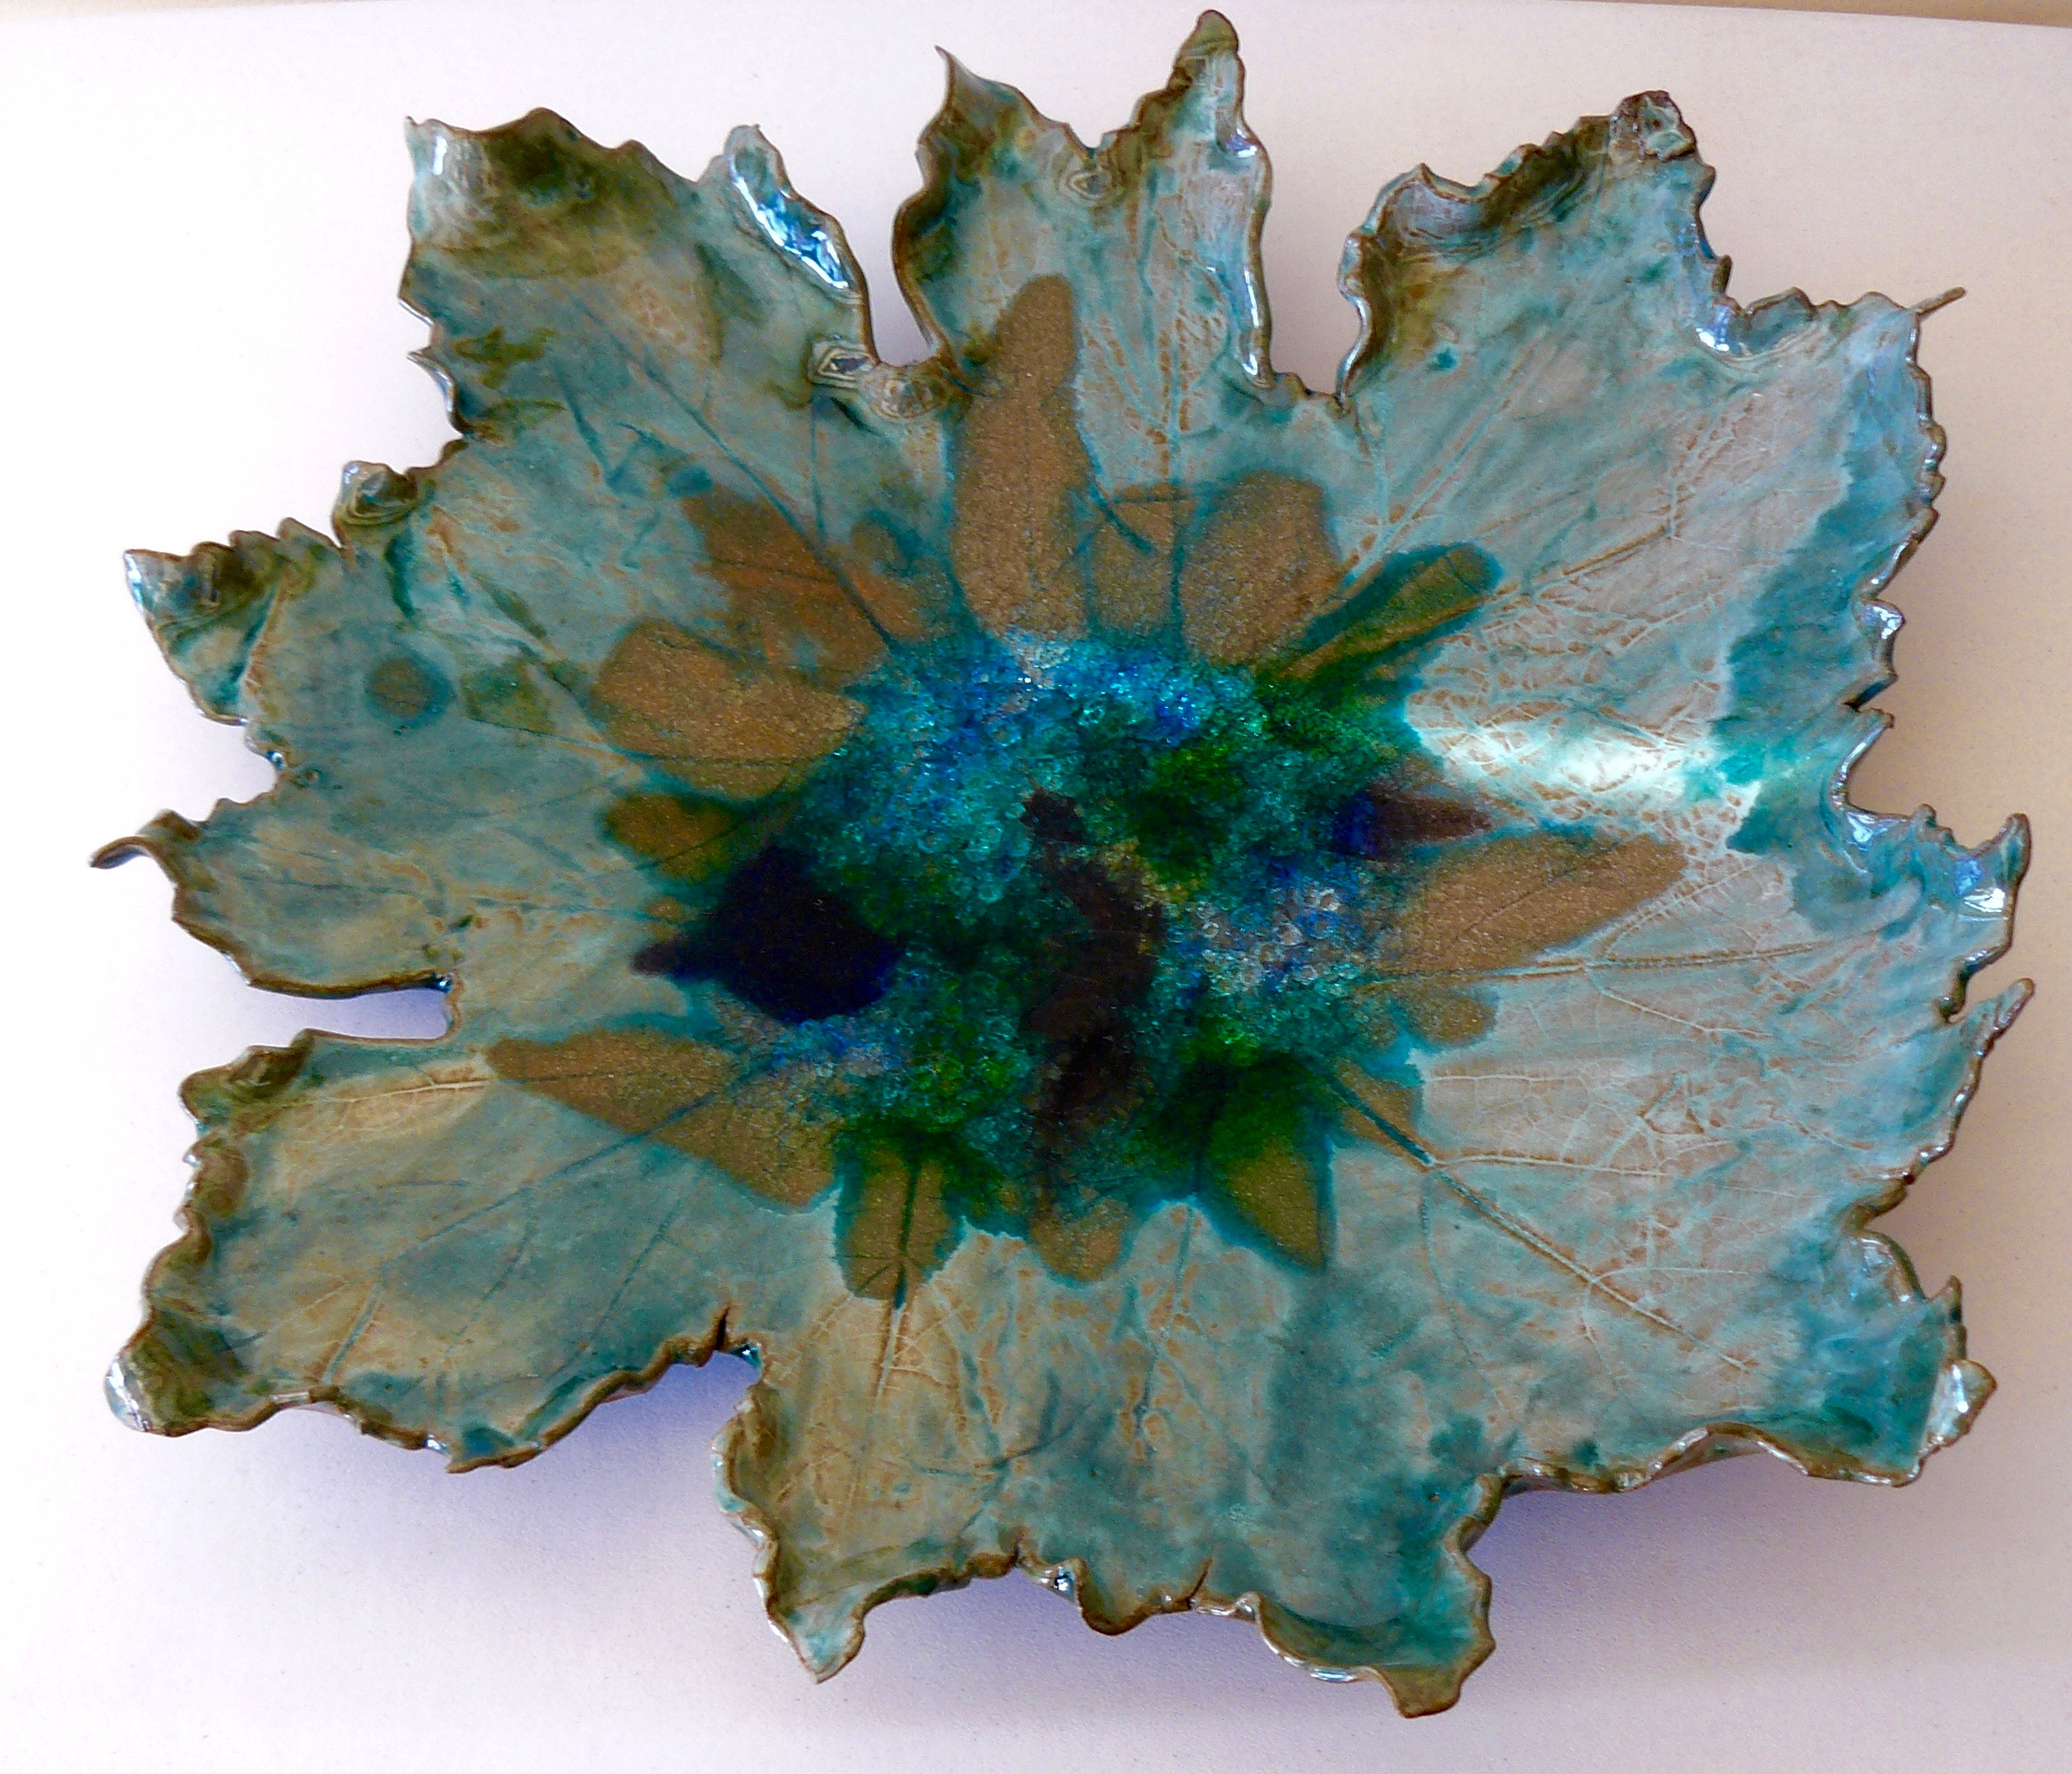 "Ceramic and Glass Flower Bowl, Ceramic and Glass, 18"" x 18"" x 4"""